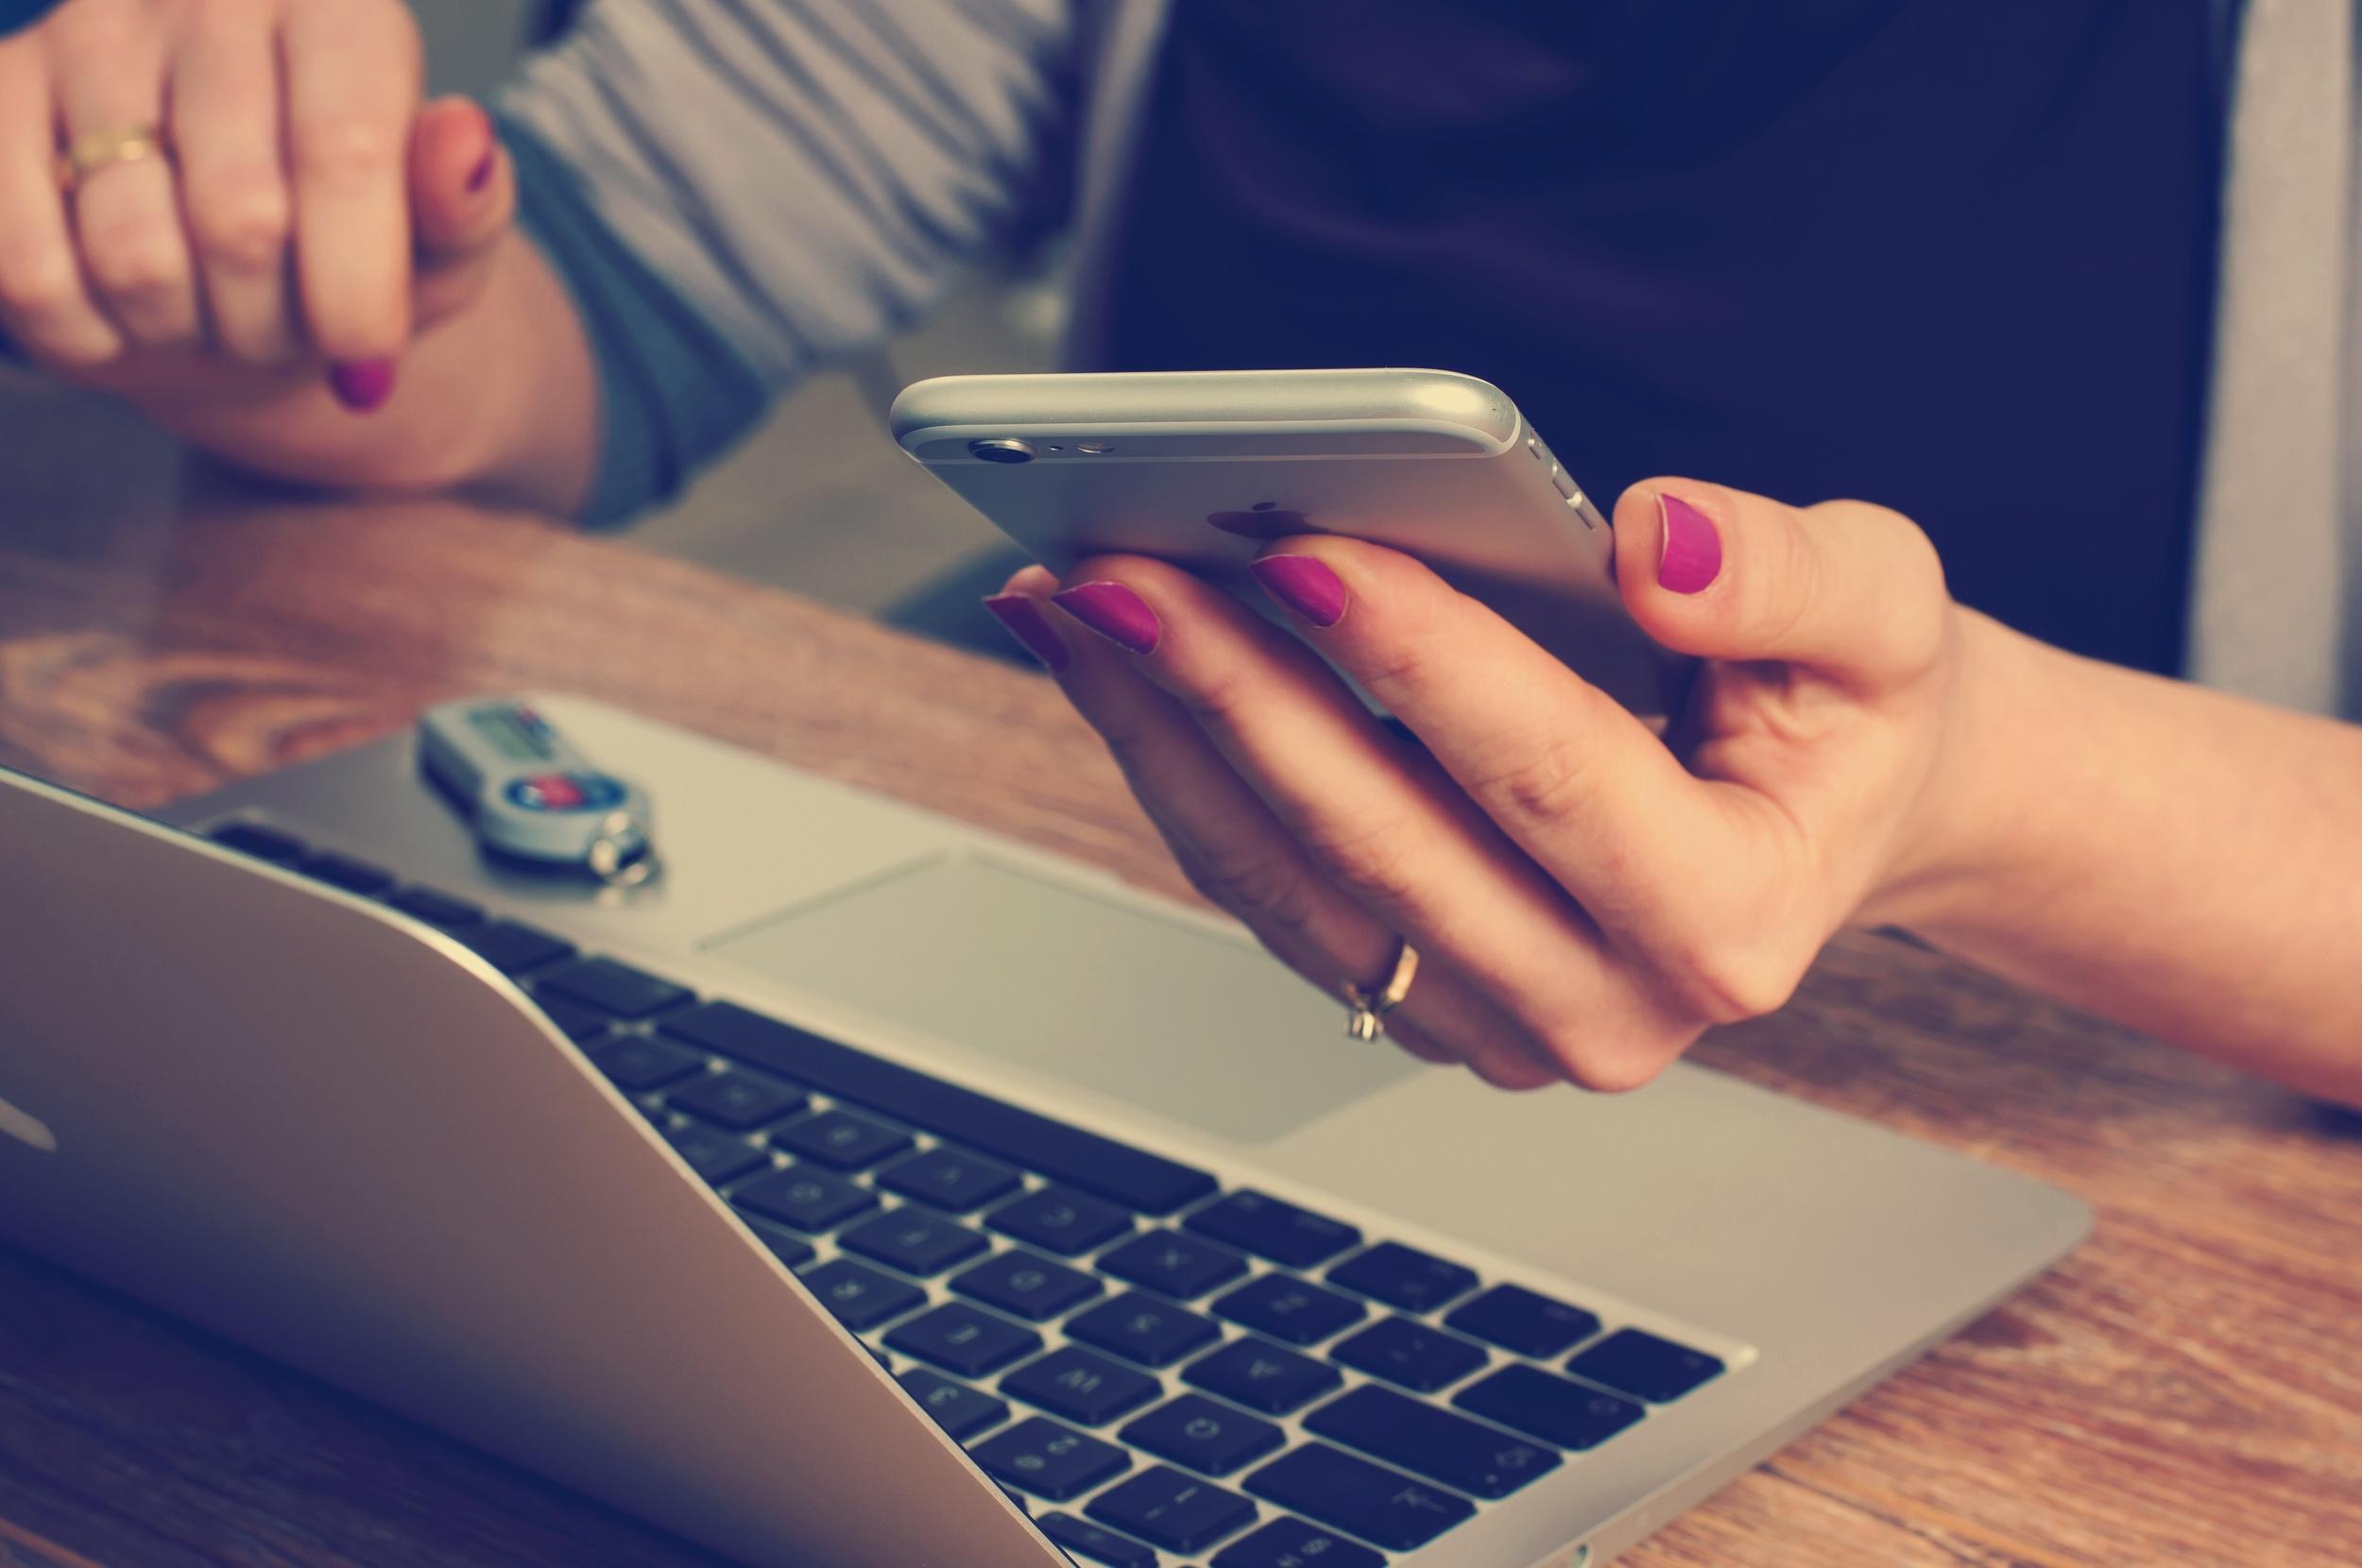 college_living_email_inbox_productivity_hacks.jpg